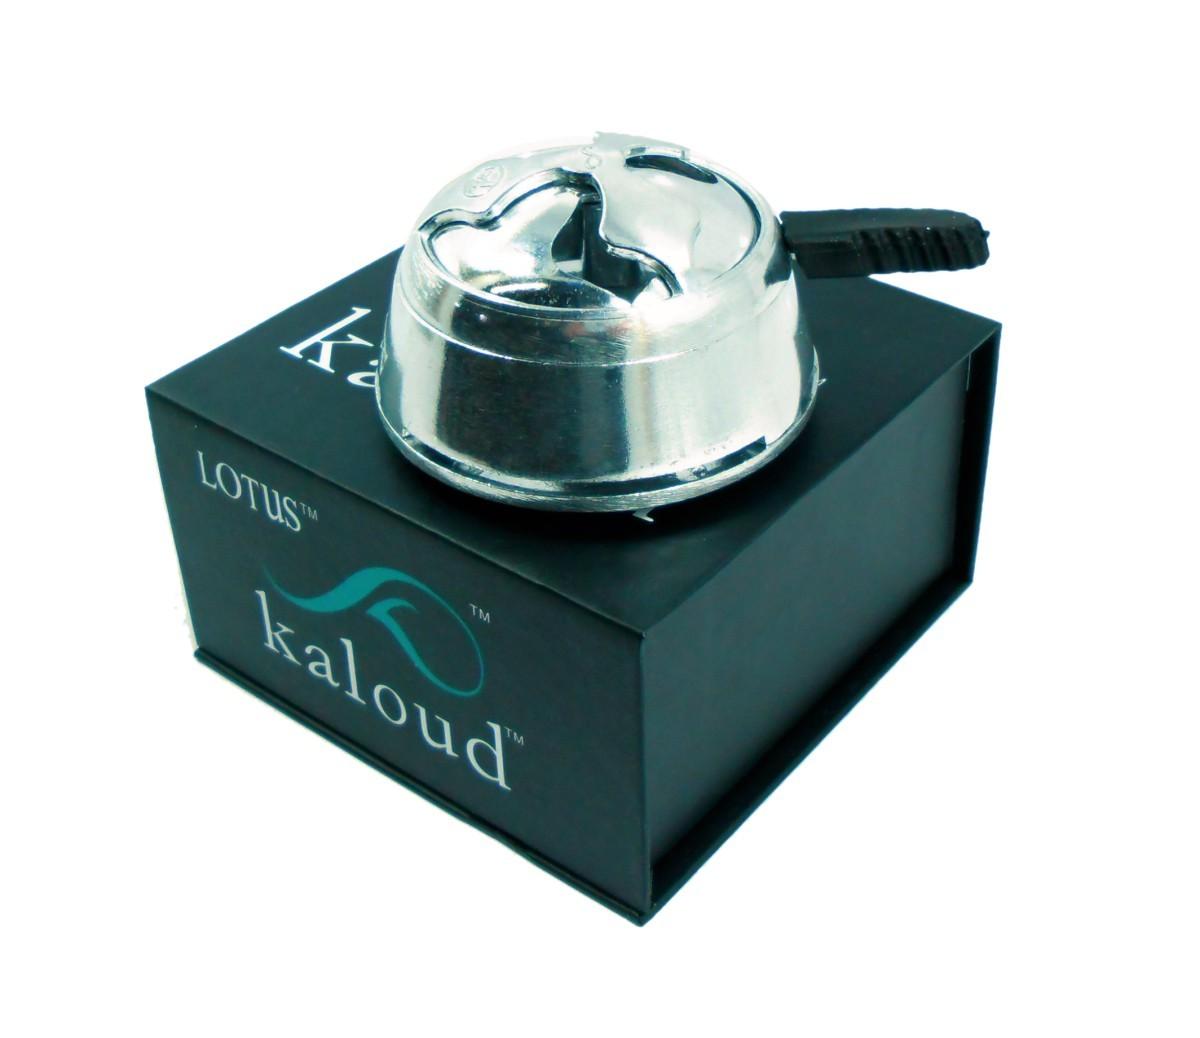 1 Controlador Kaloud Lotus + 1 Rosh Samsaris Vitria + Brinde